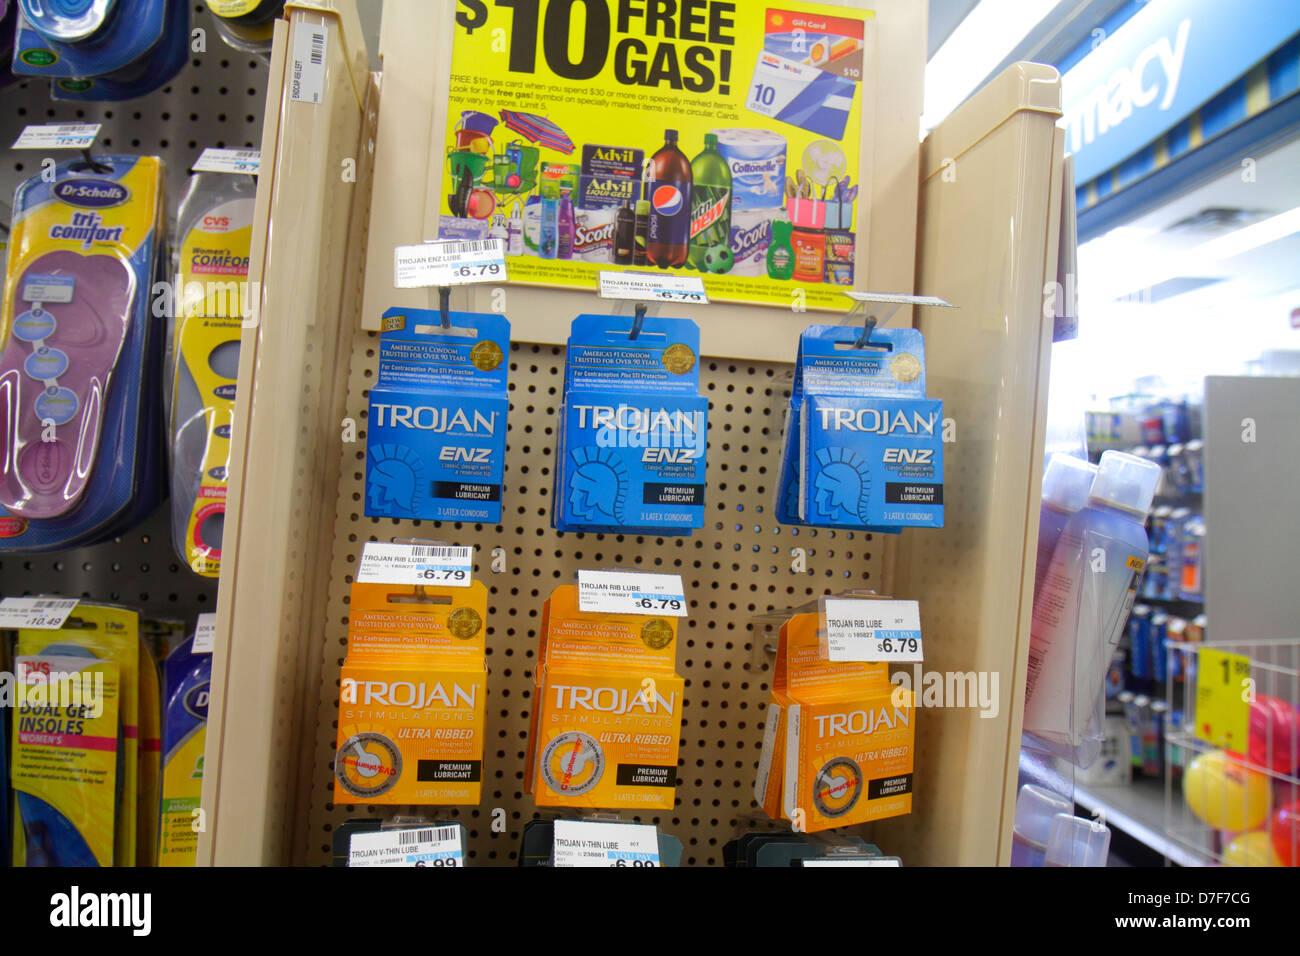 Miami Beach Florida CVS pharmacy drugstore for sale retail display  packaging competing brands shelves Trojan condoms